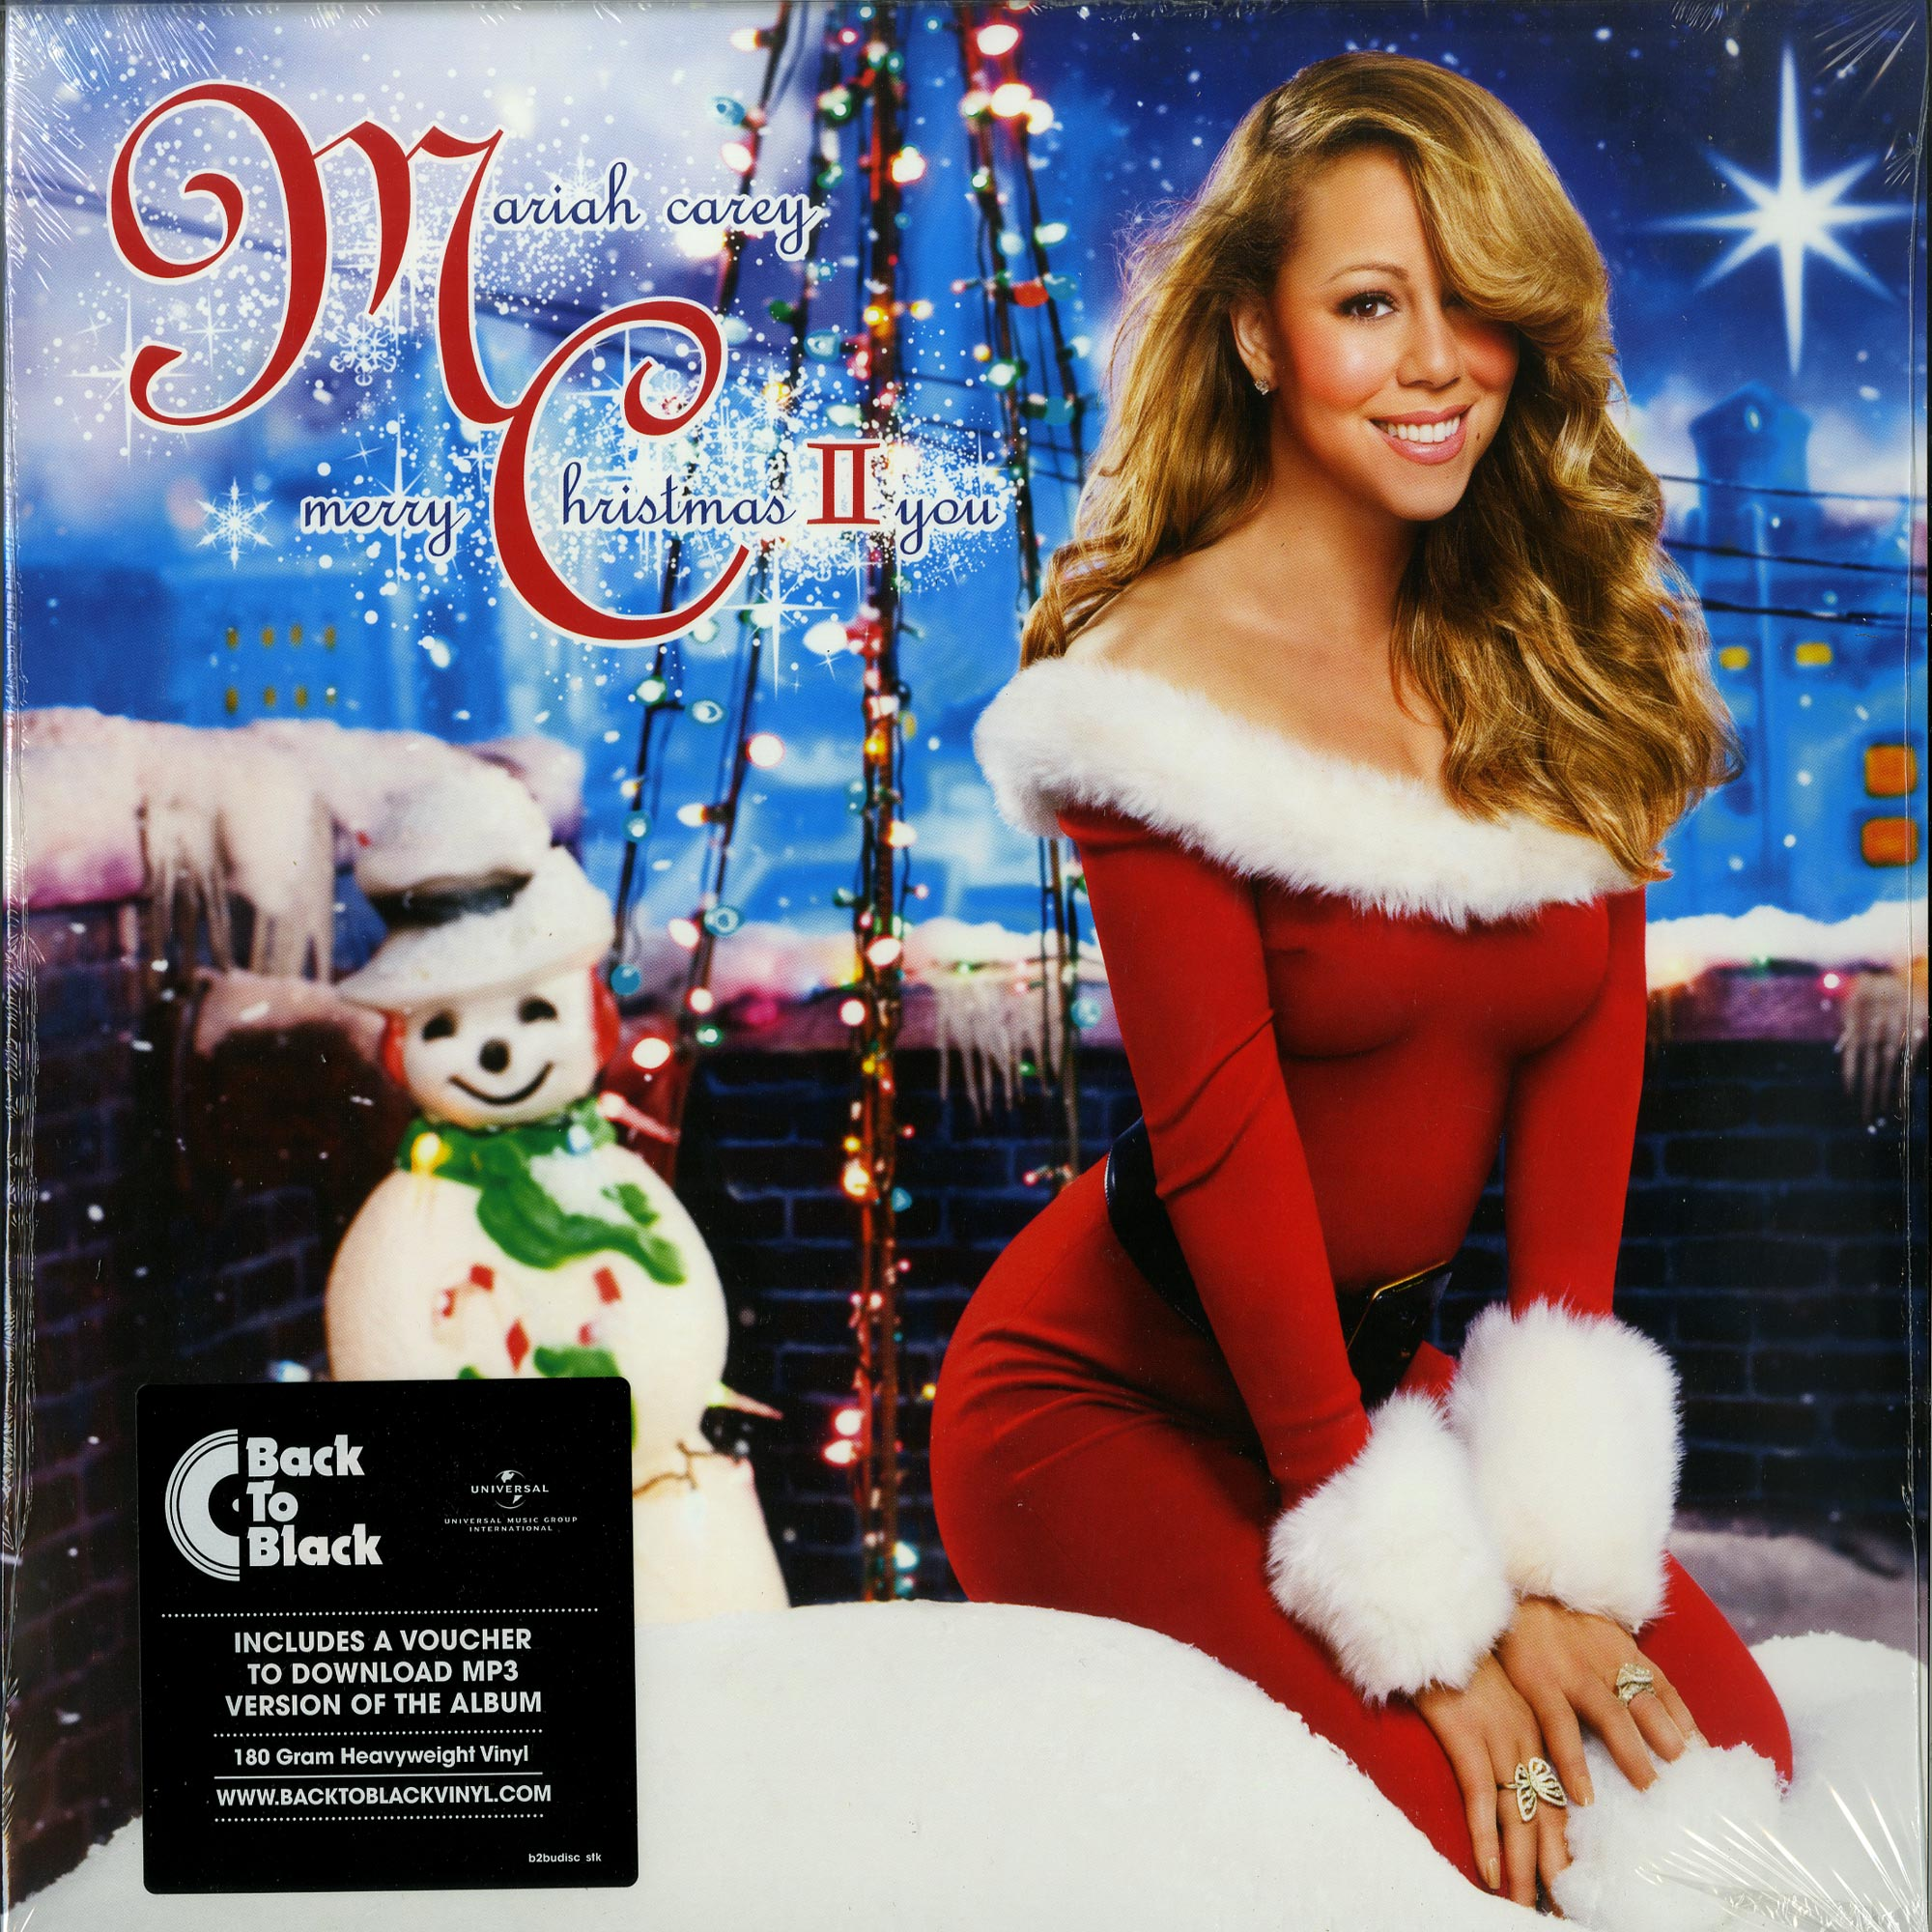 Mariah Carey Christmas.Mariah Carey Merry Christmas Ii You